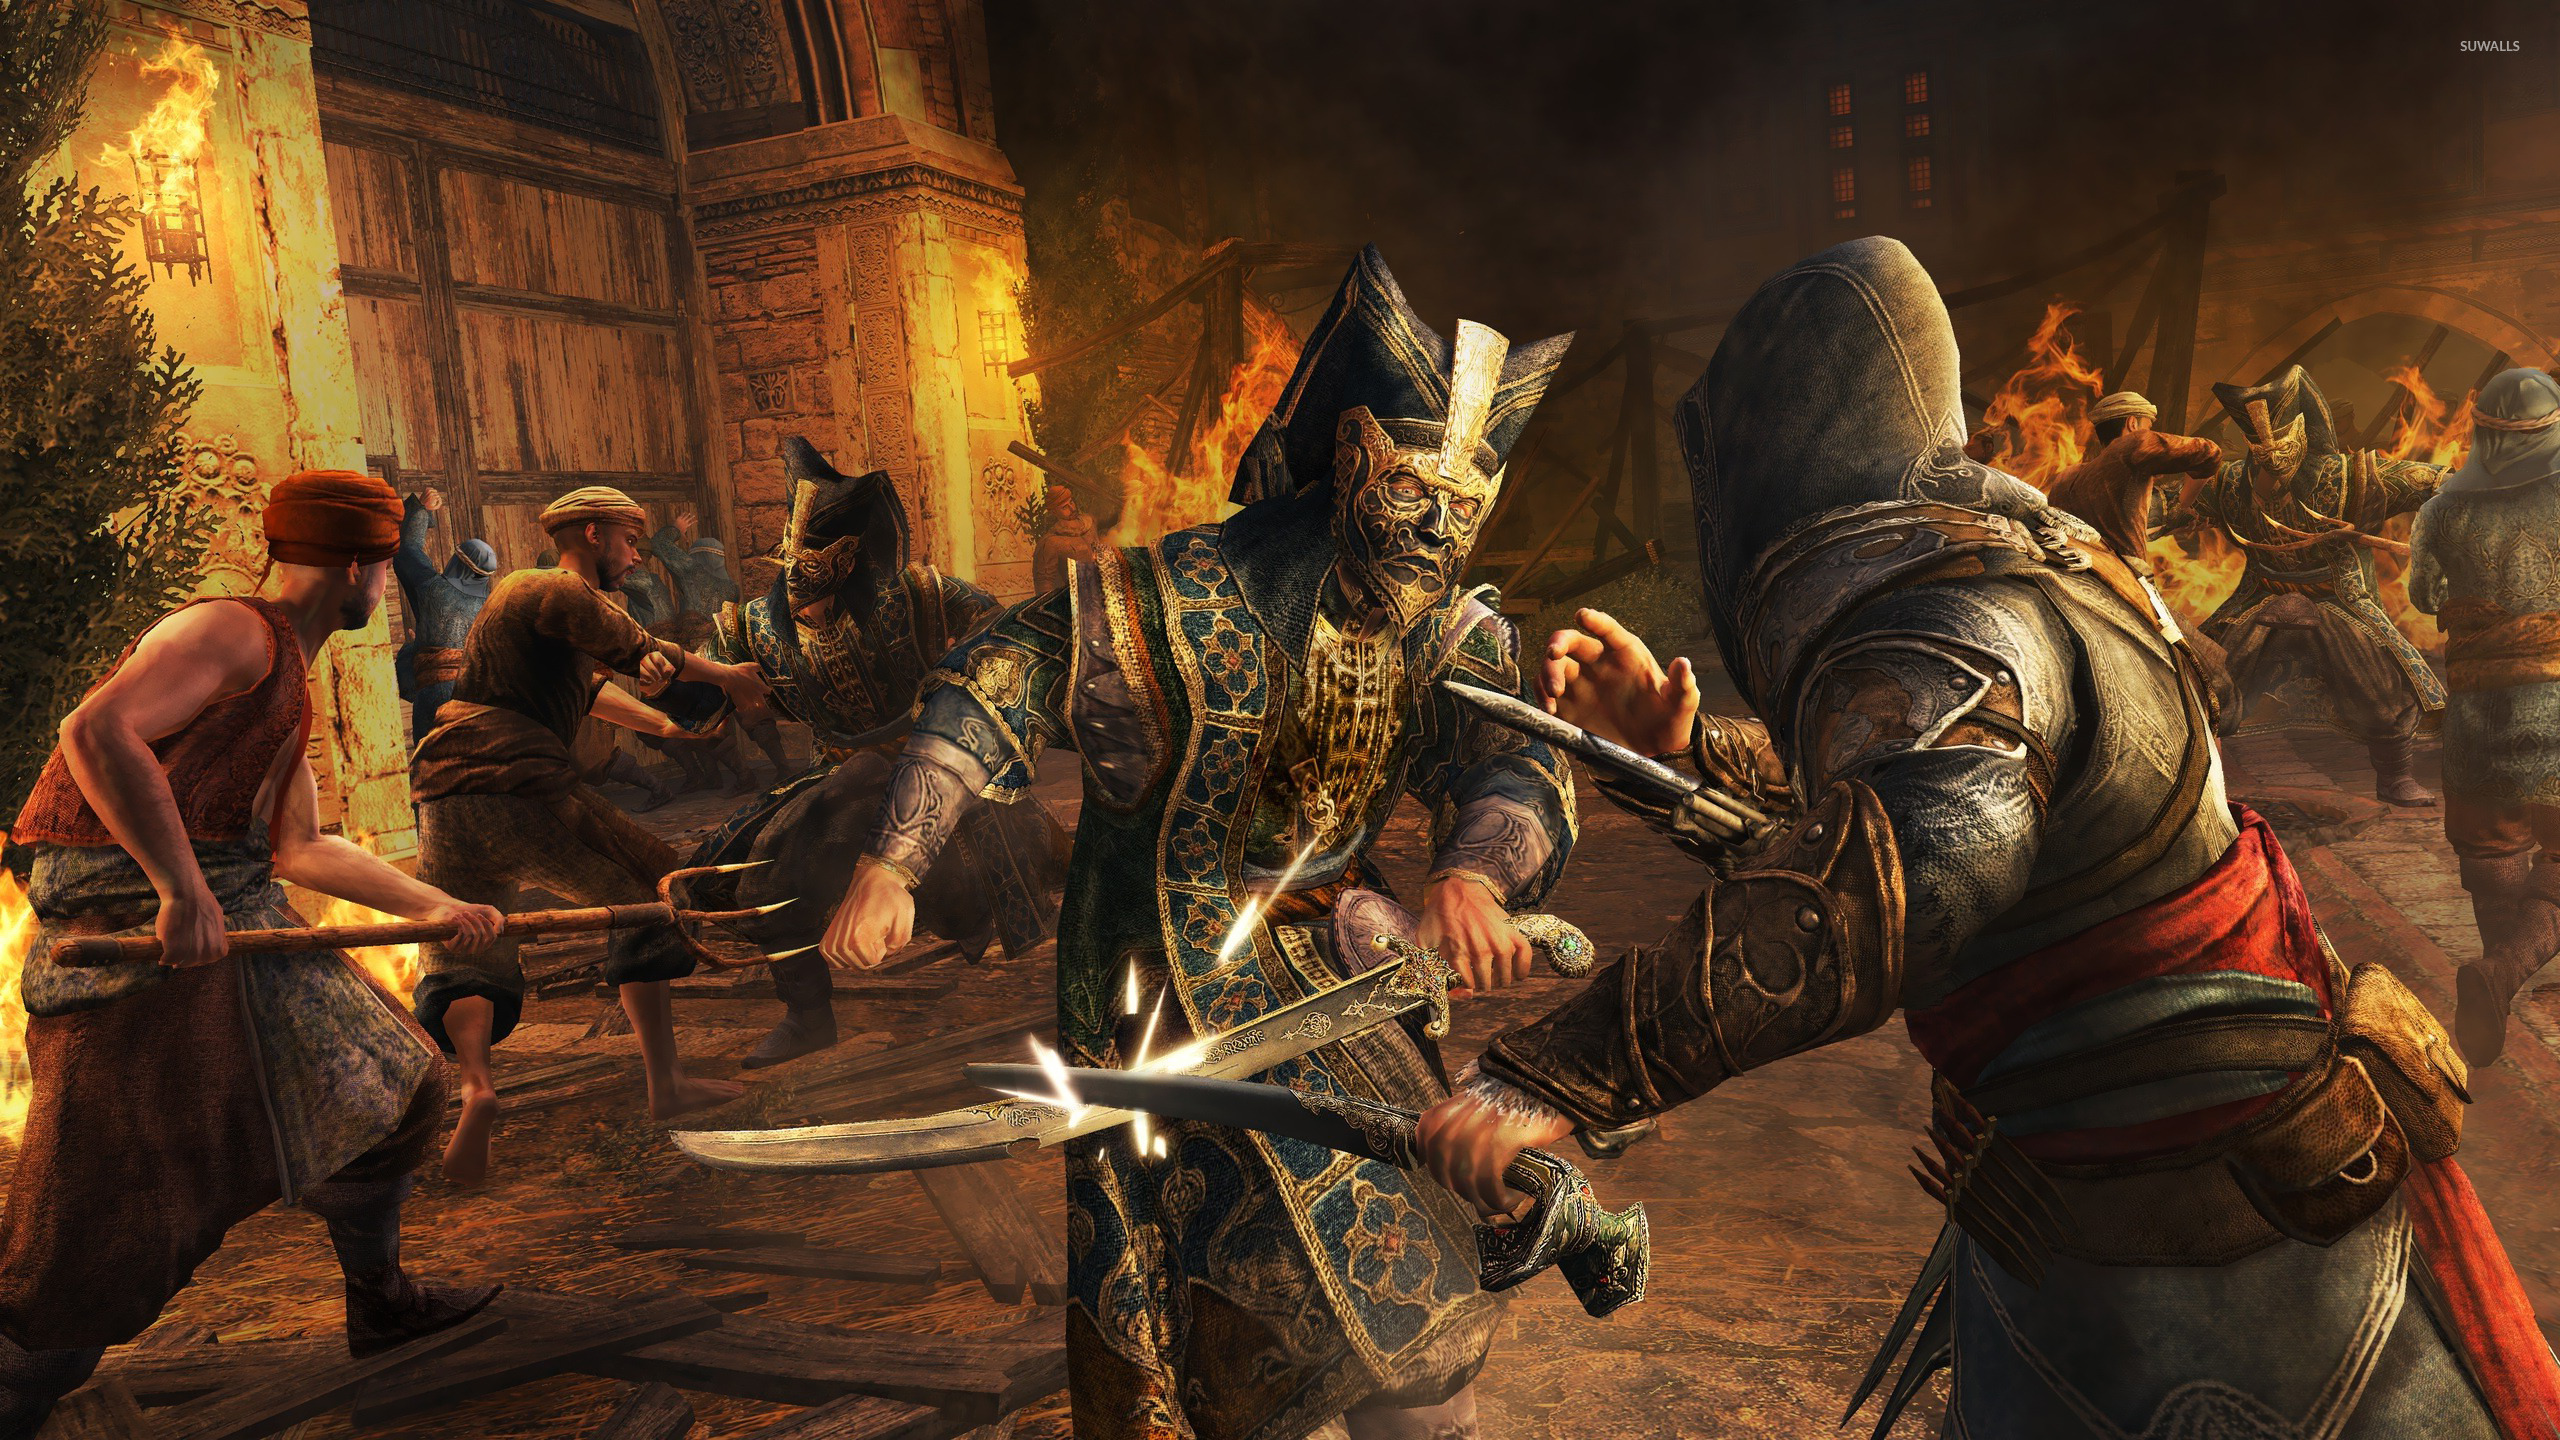 Good Wallpaper Minecraft Assassin - assassins-creed-revelations-18892-2560x1440  HD_425455.jpg